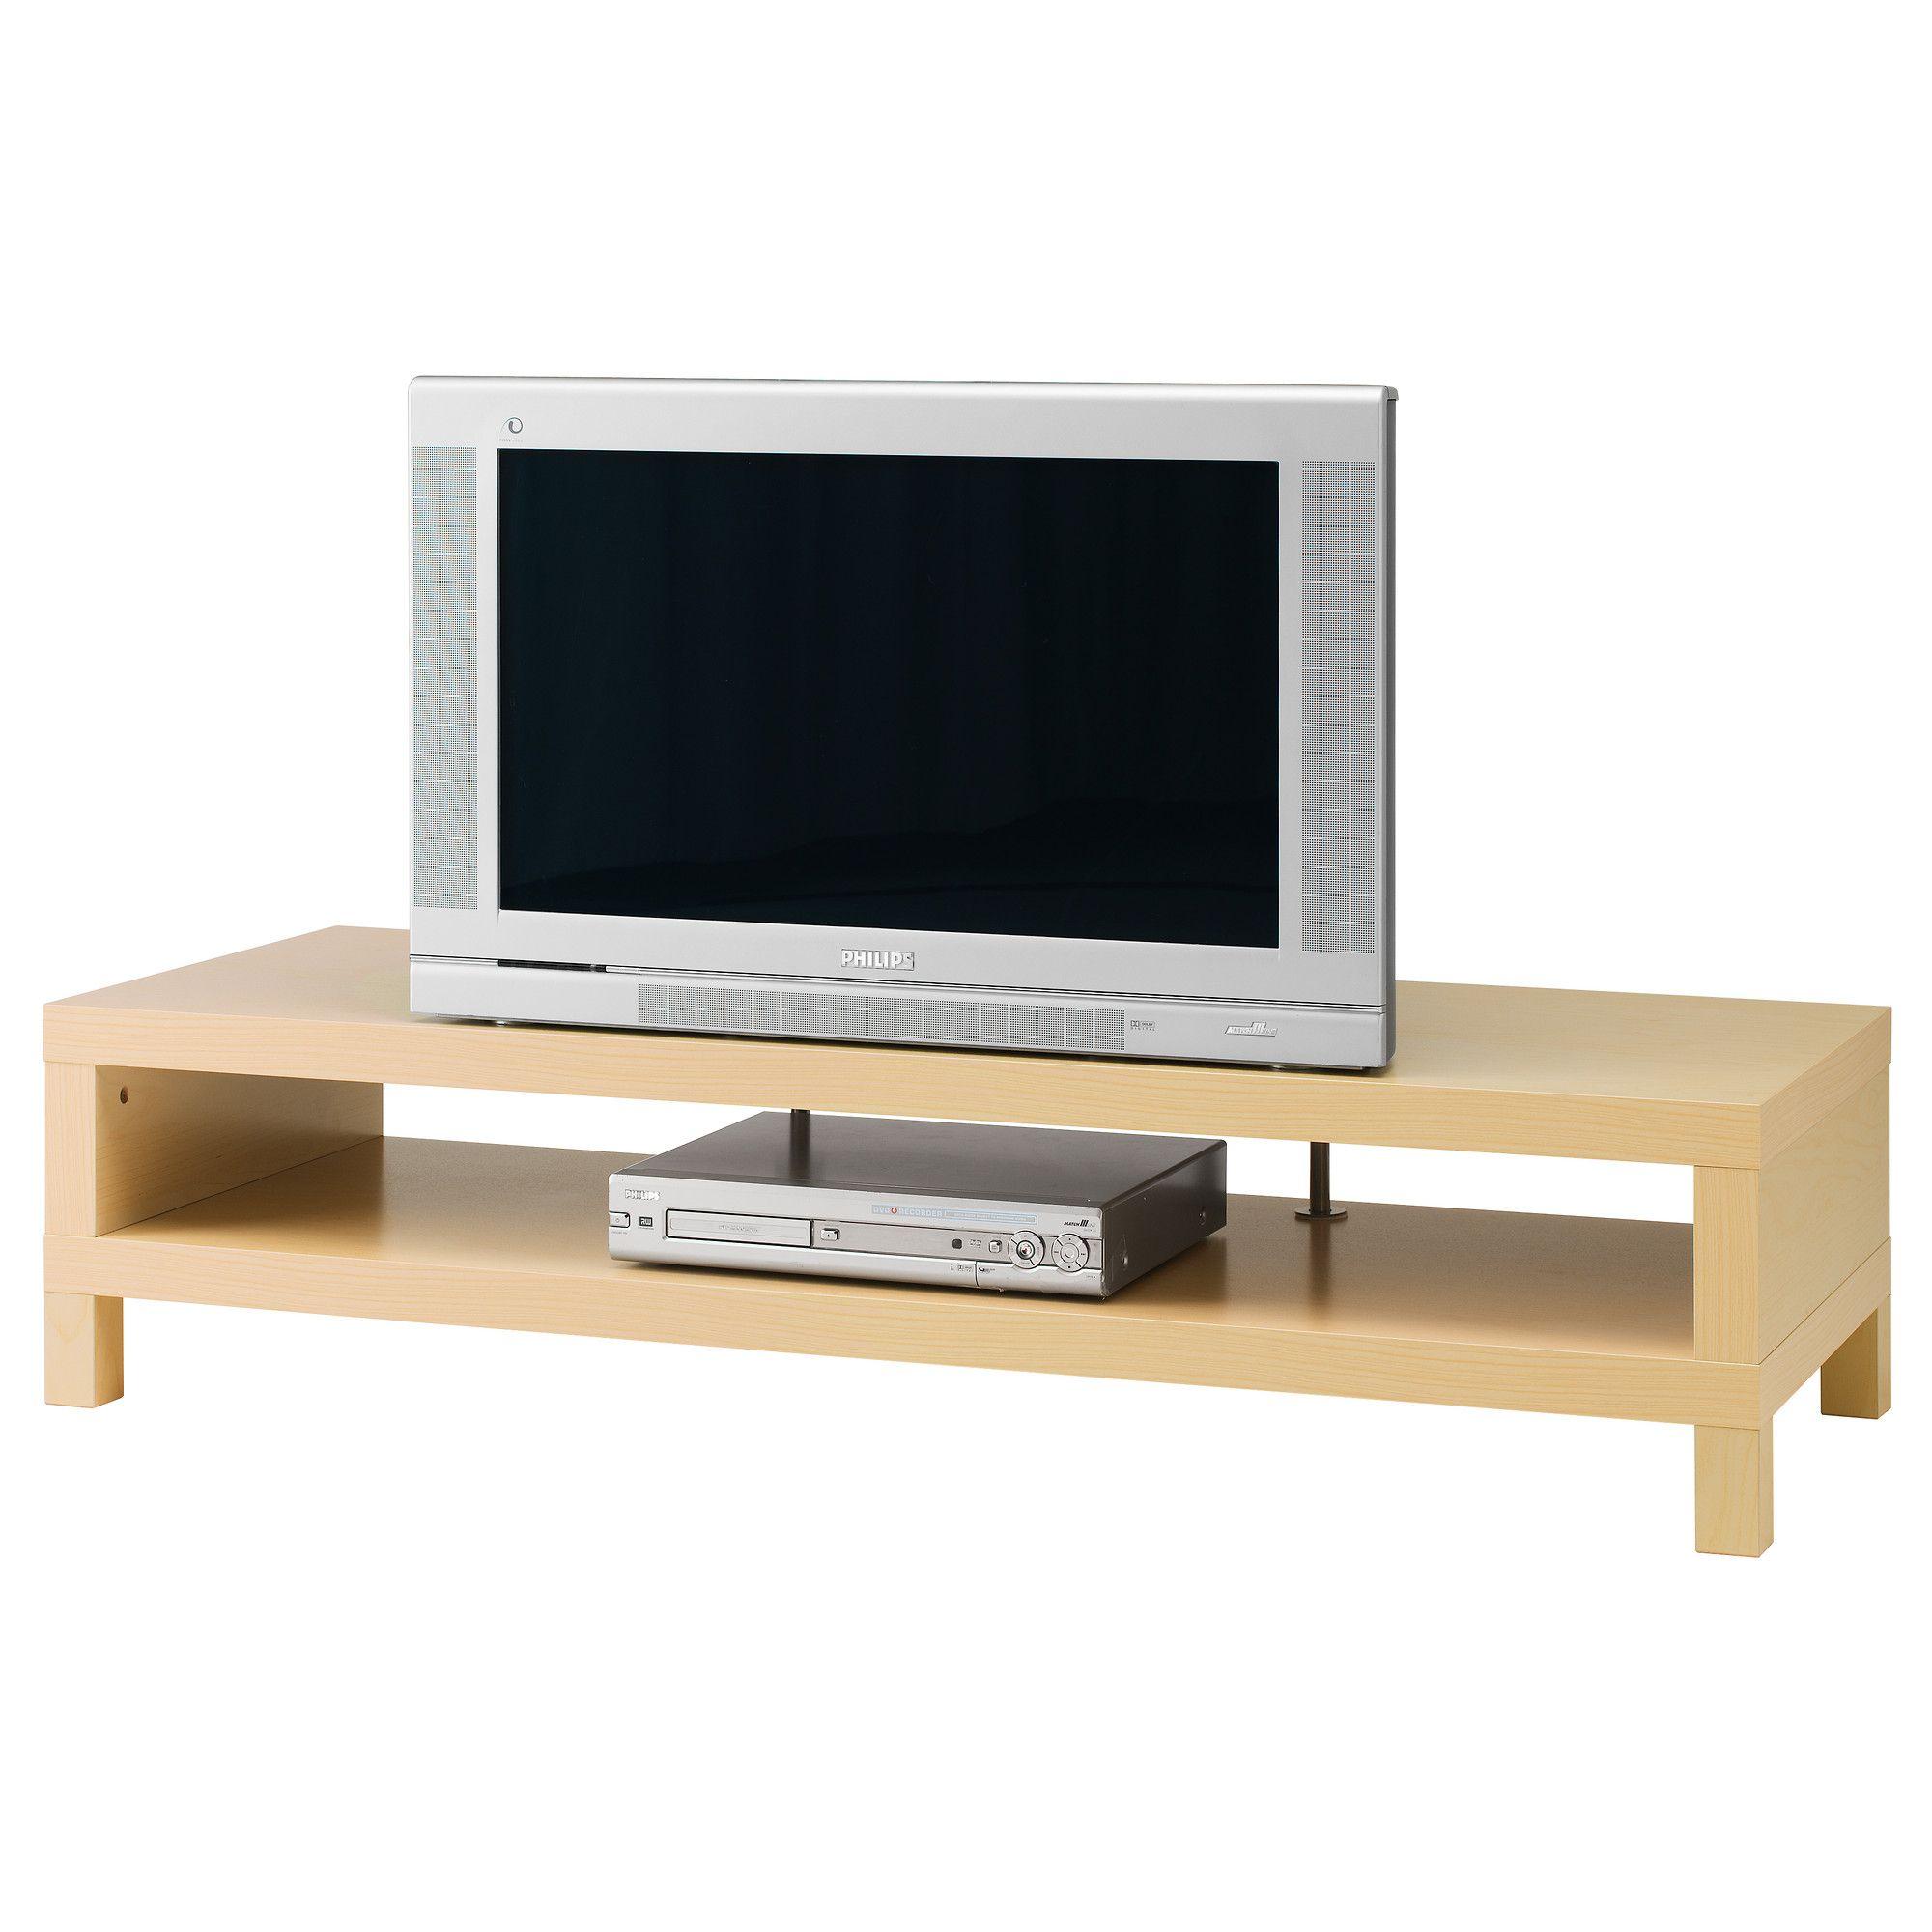 Furniture And Home Furnishings Ikea Tv Stand Tv Bench Ikea Tv